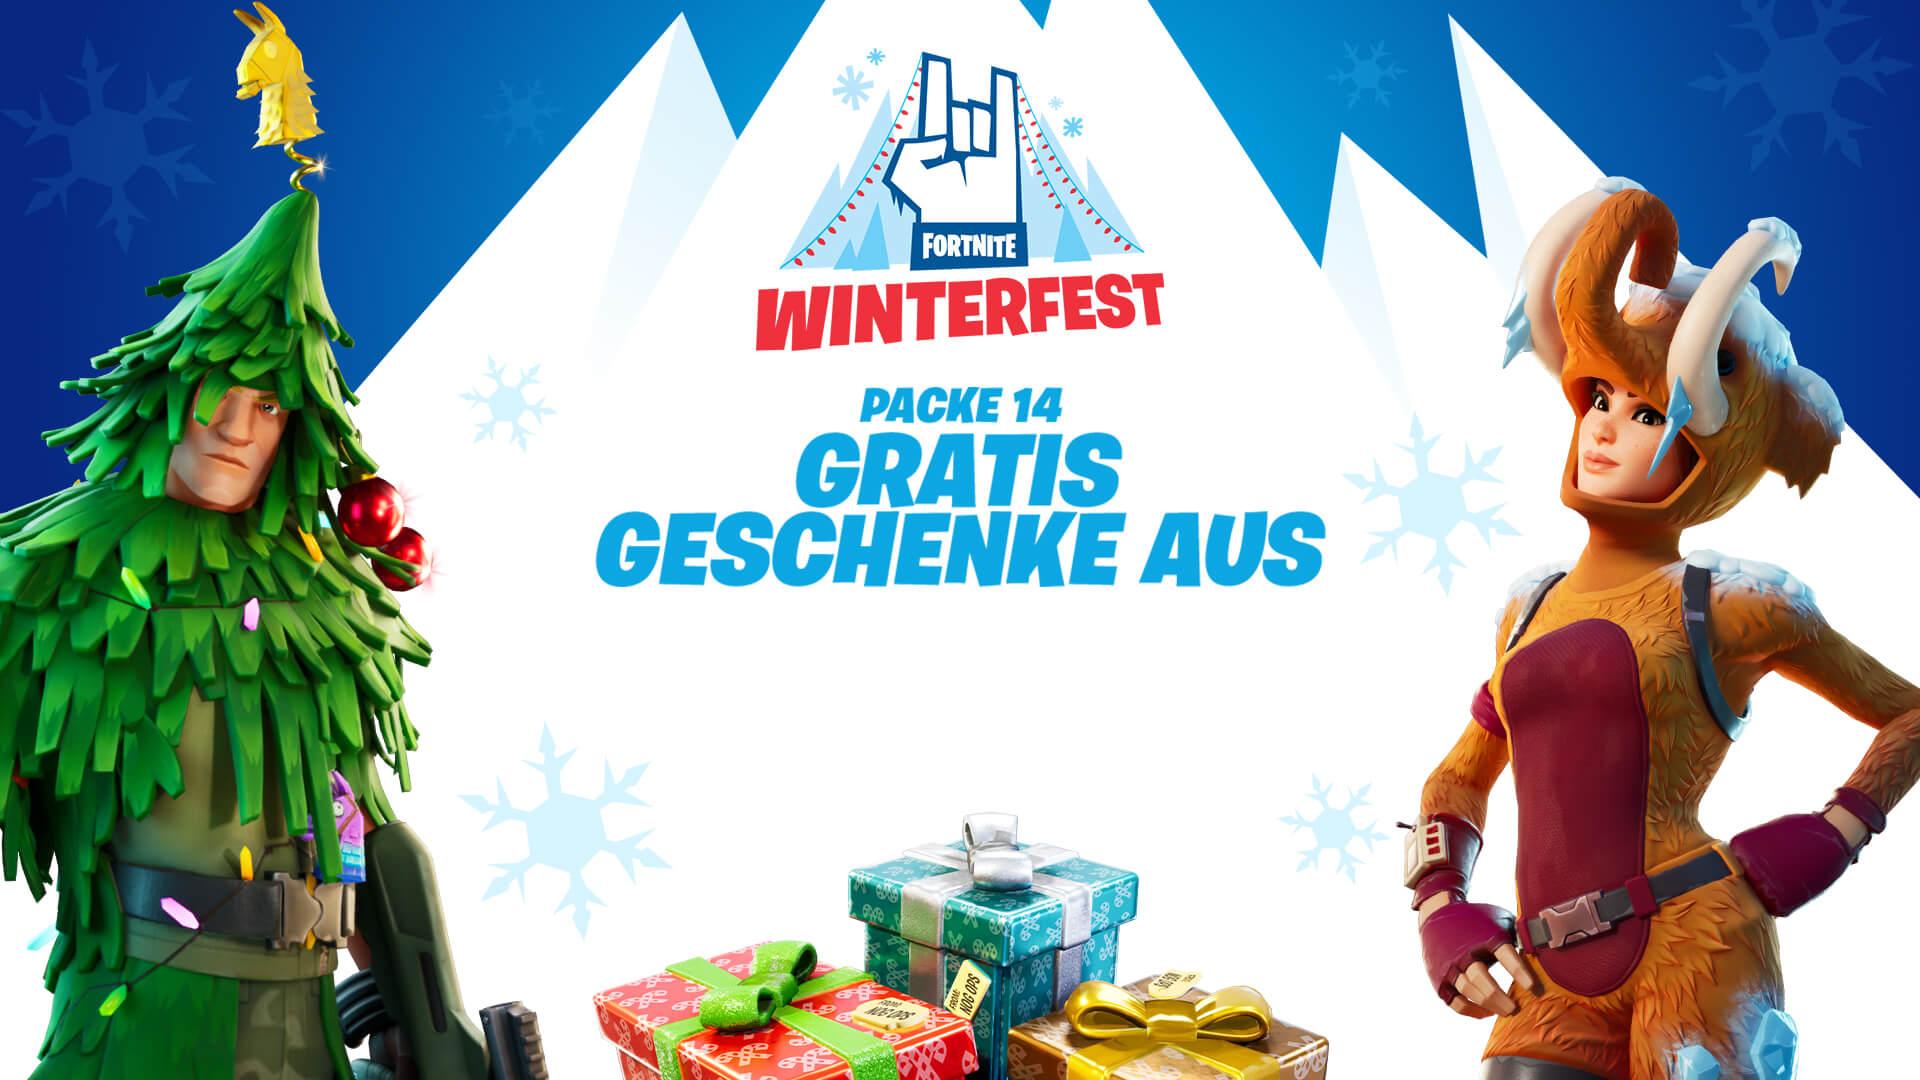 DE_11BR_WinterFest_Announce_Social.jpg